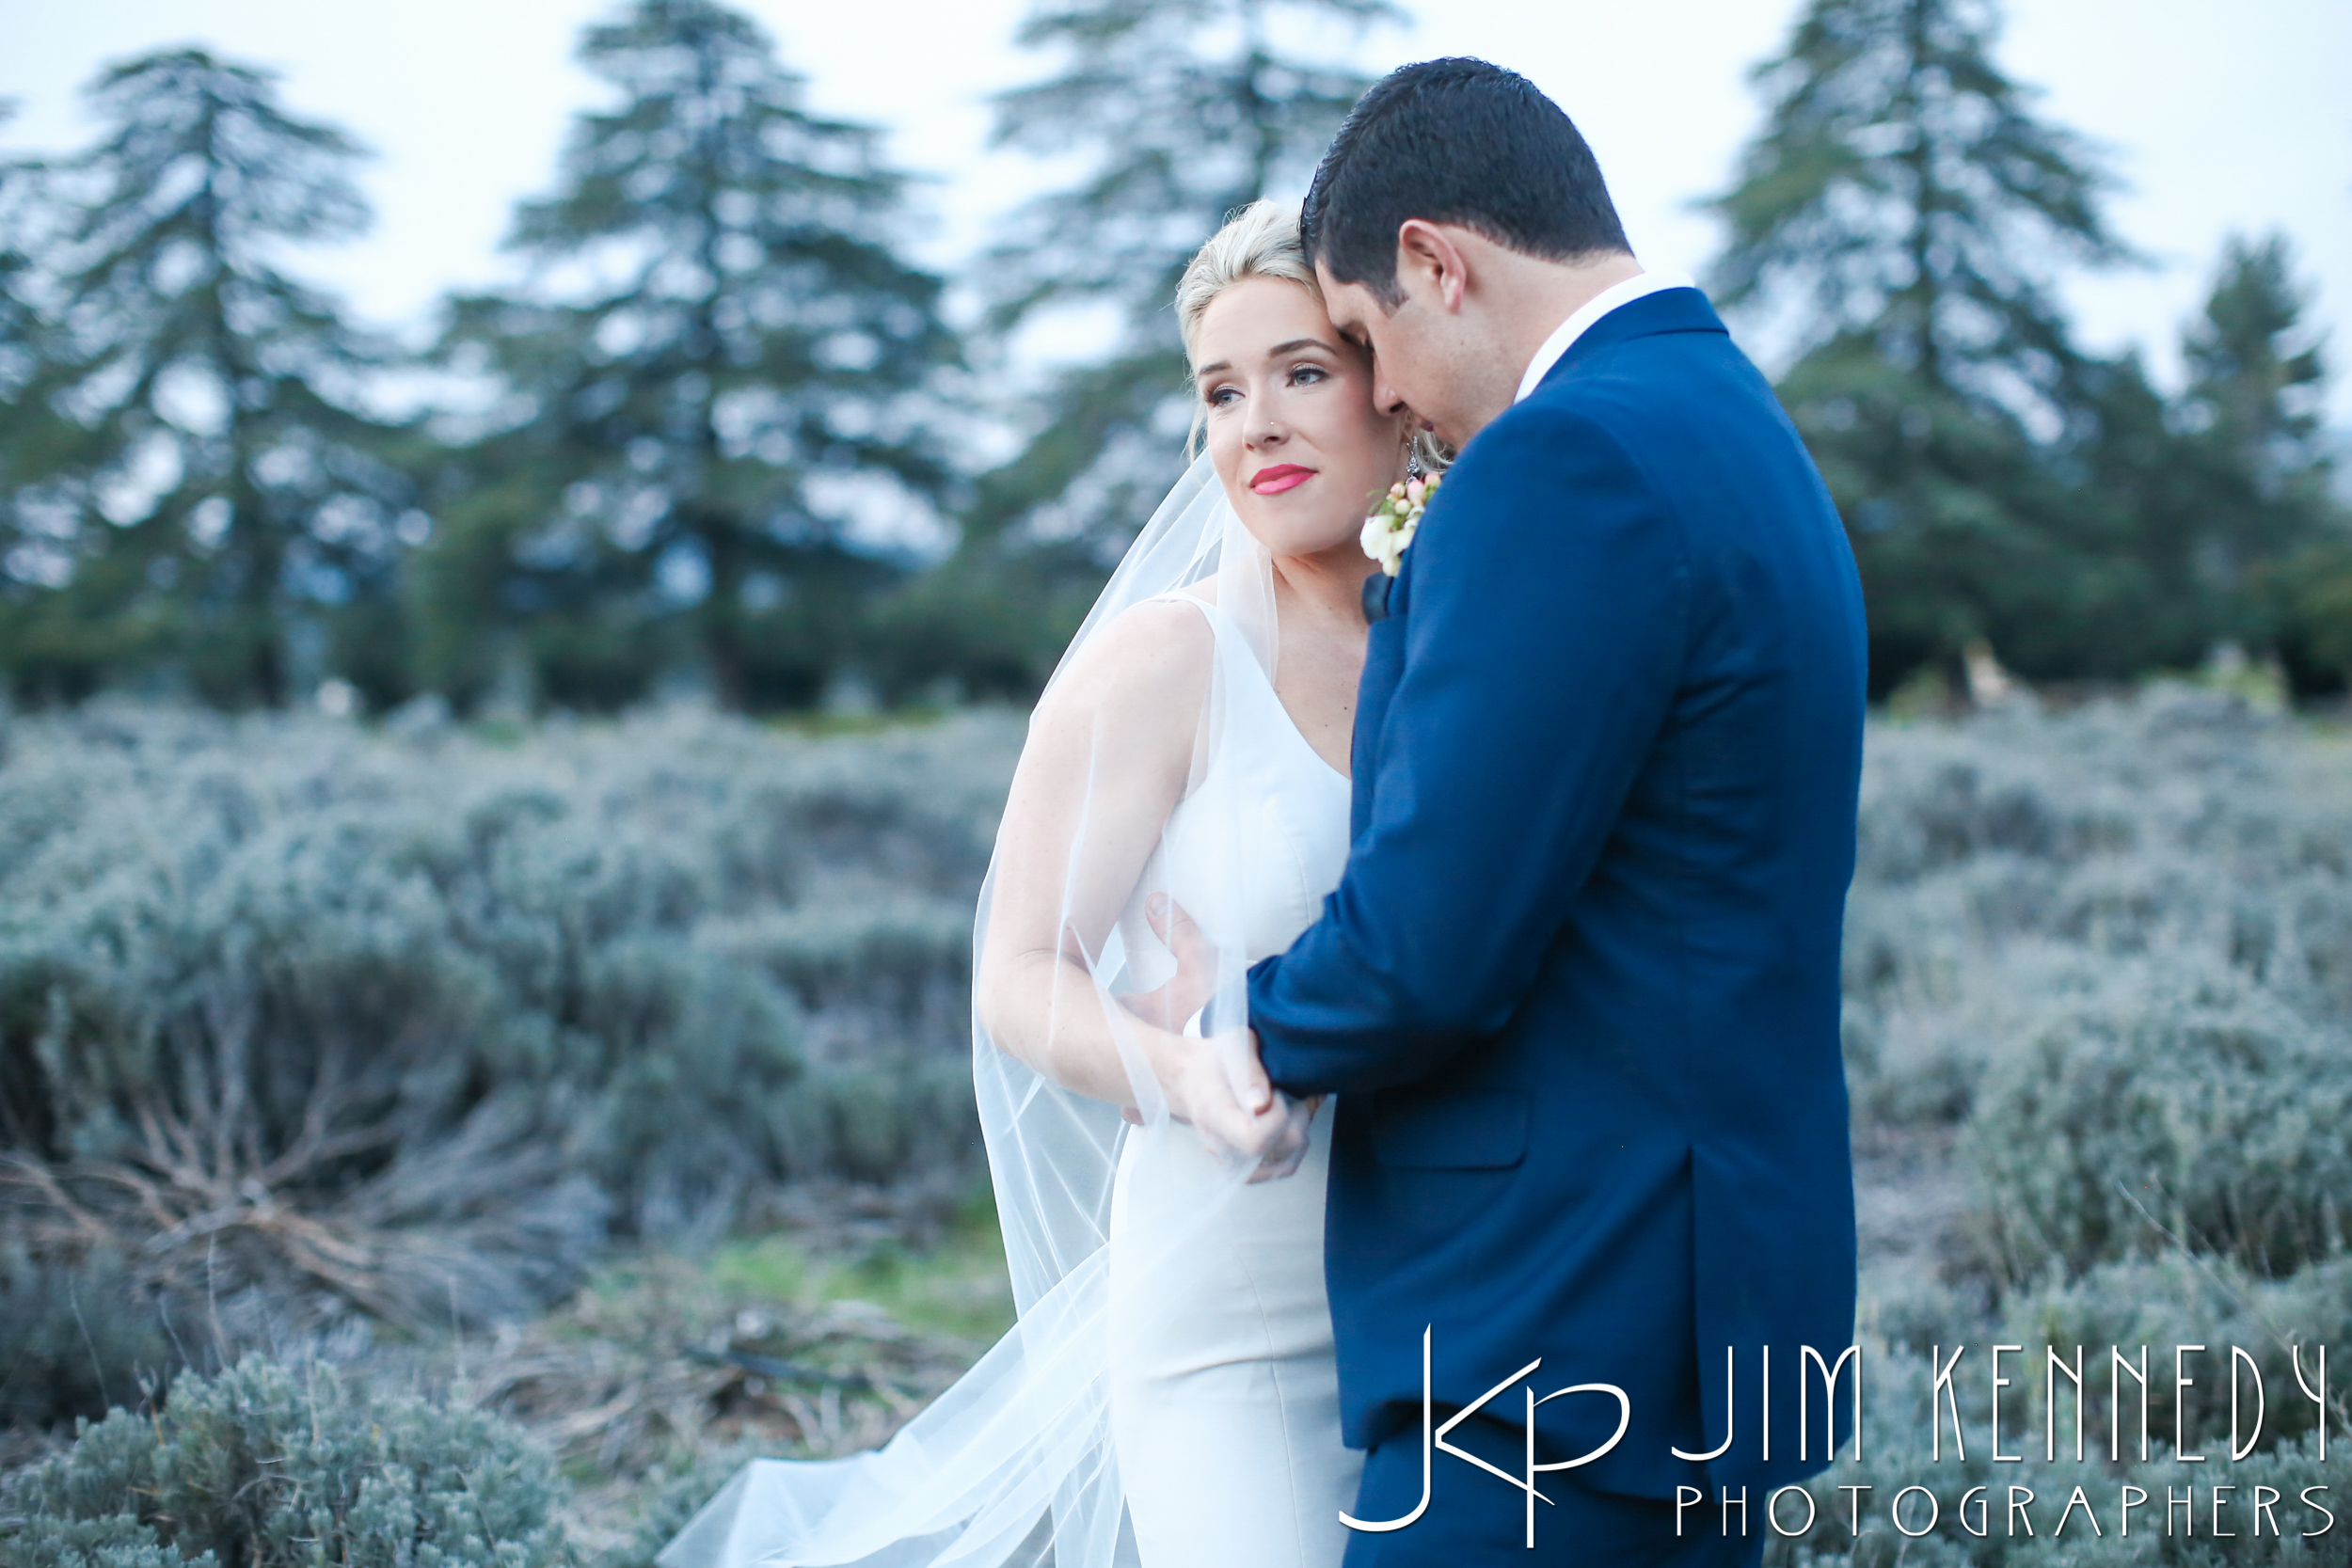 jim_kennedy_photographers_highland_springs_wedding_caitlyn_0164.jpg